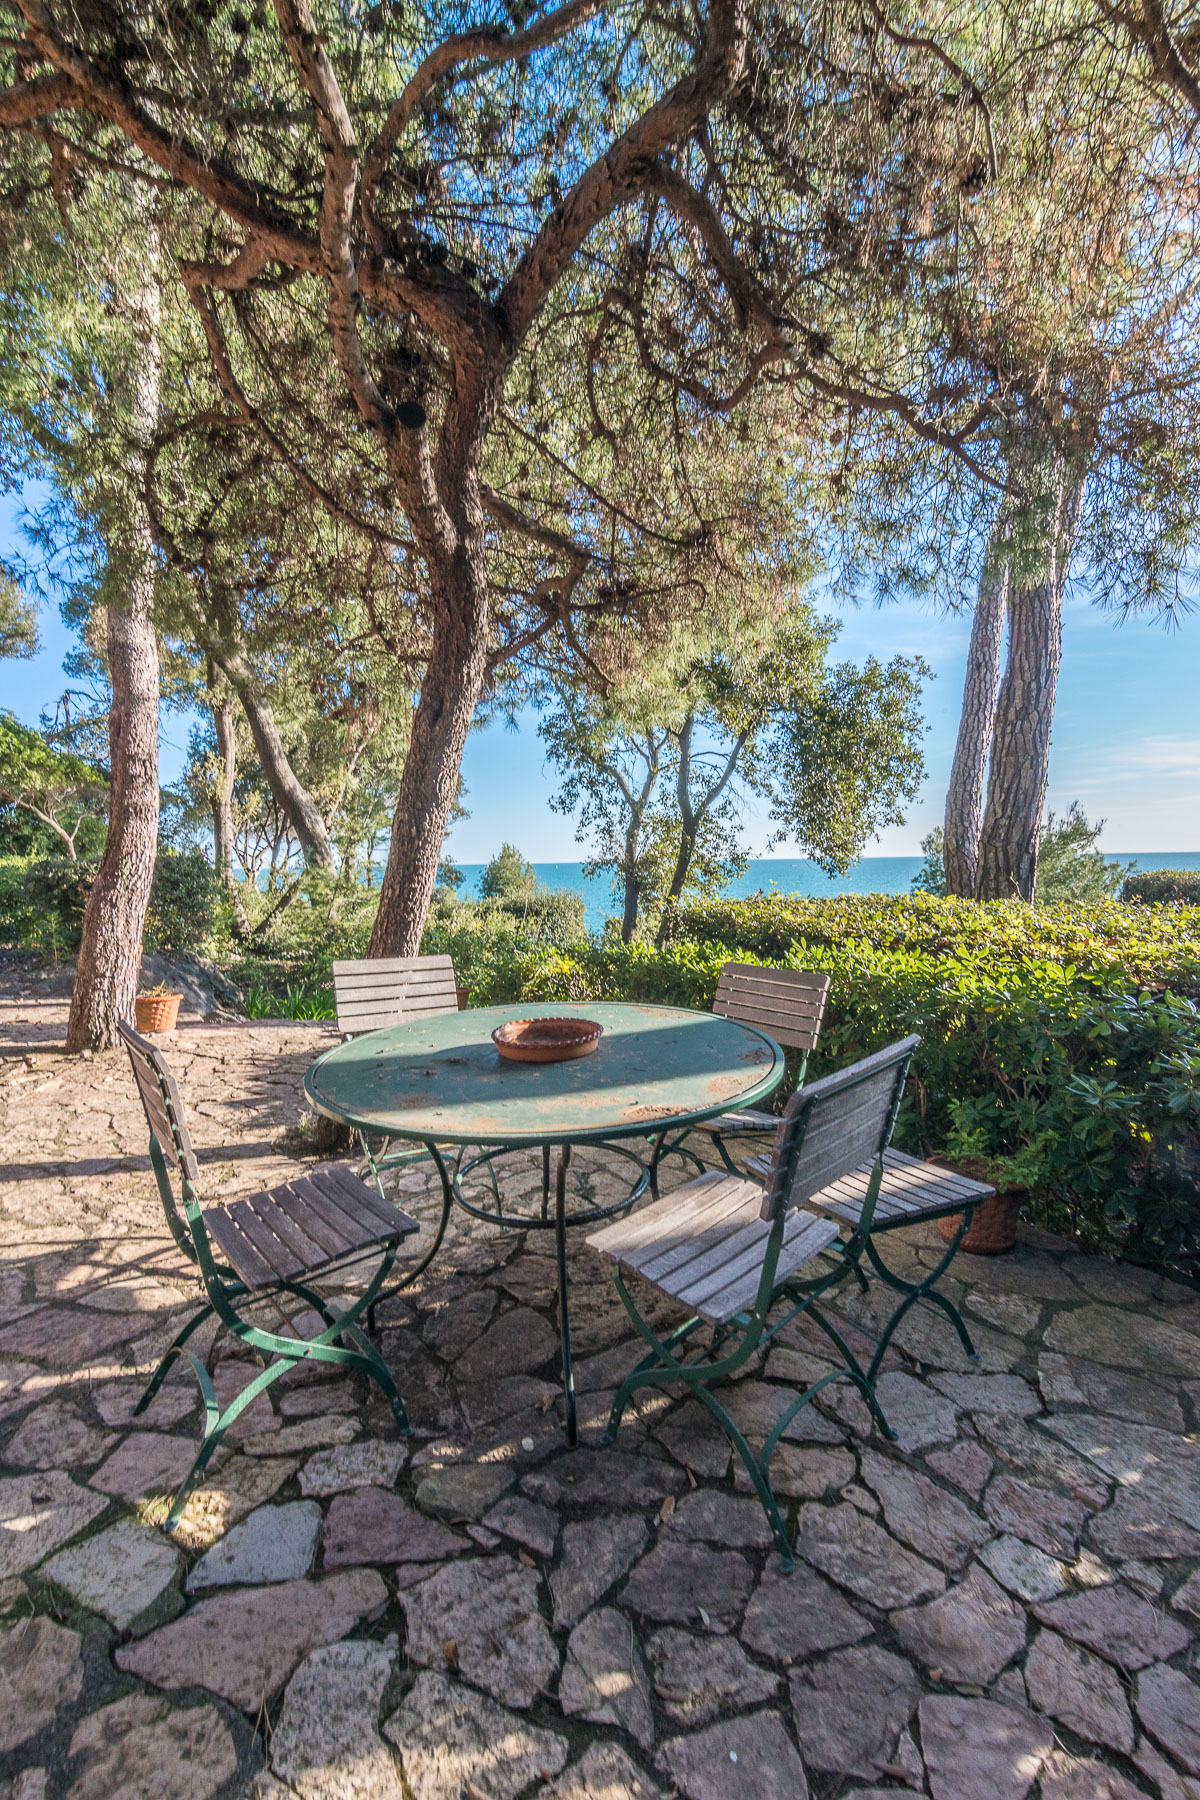 Villa in Vendita a Lerici: 5 locali, 330 mq - Foto 9